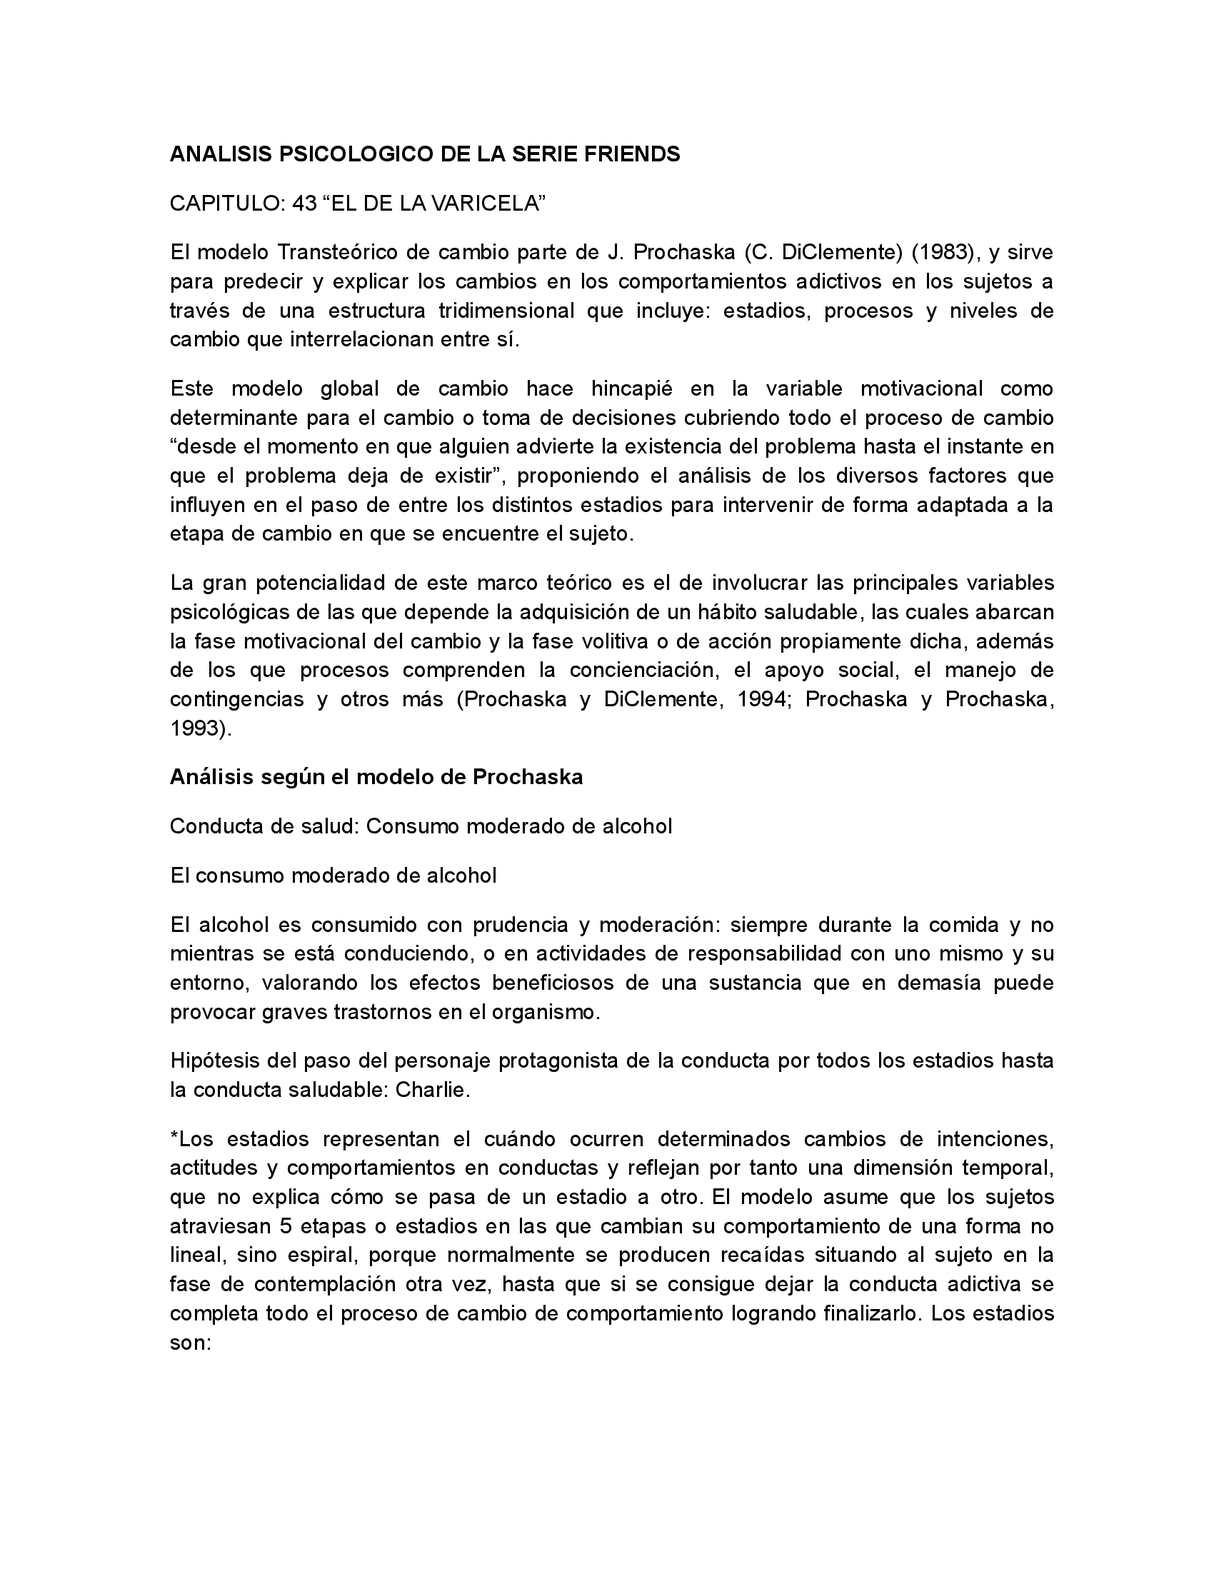 Calaméo Analisis Psicologico De La Serie Friends